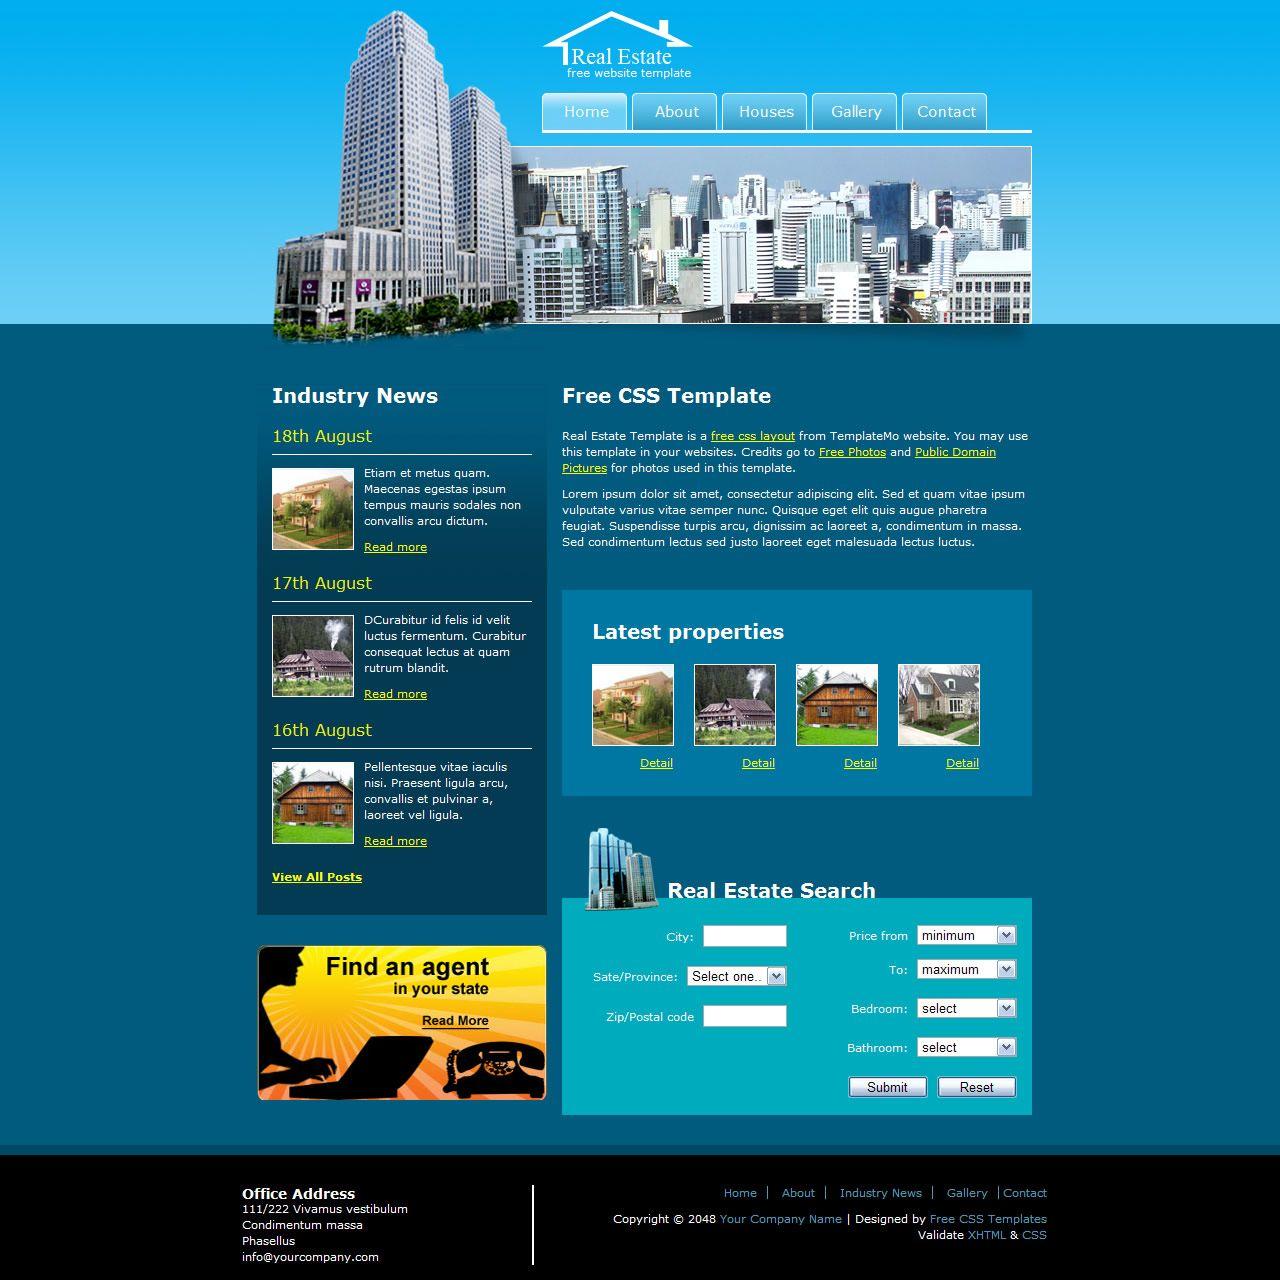 templatemo 196 real estate | Free Real Estate HTML Templates ...